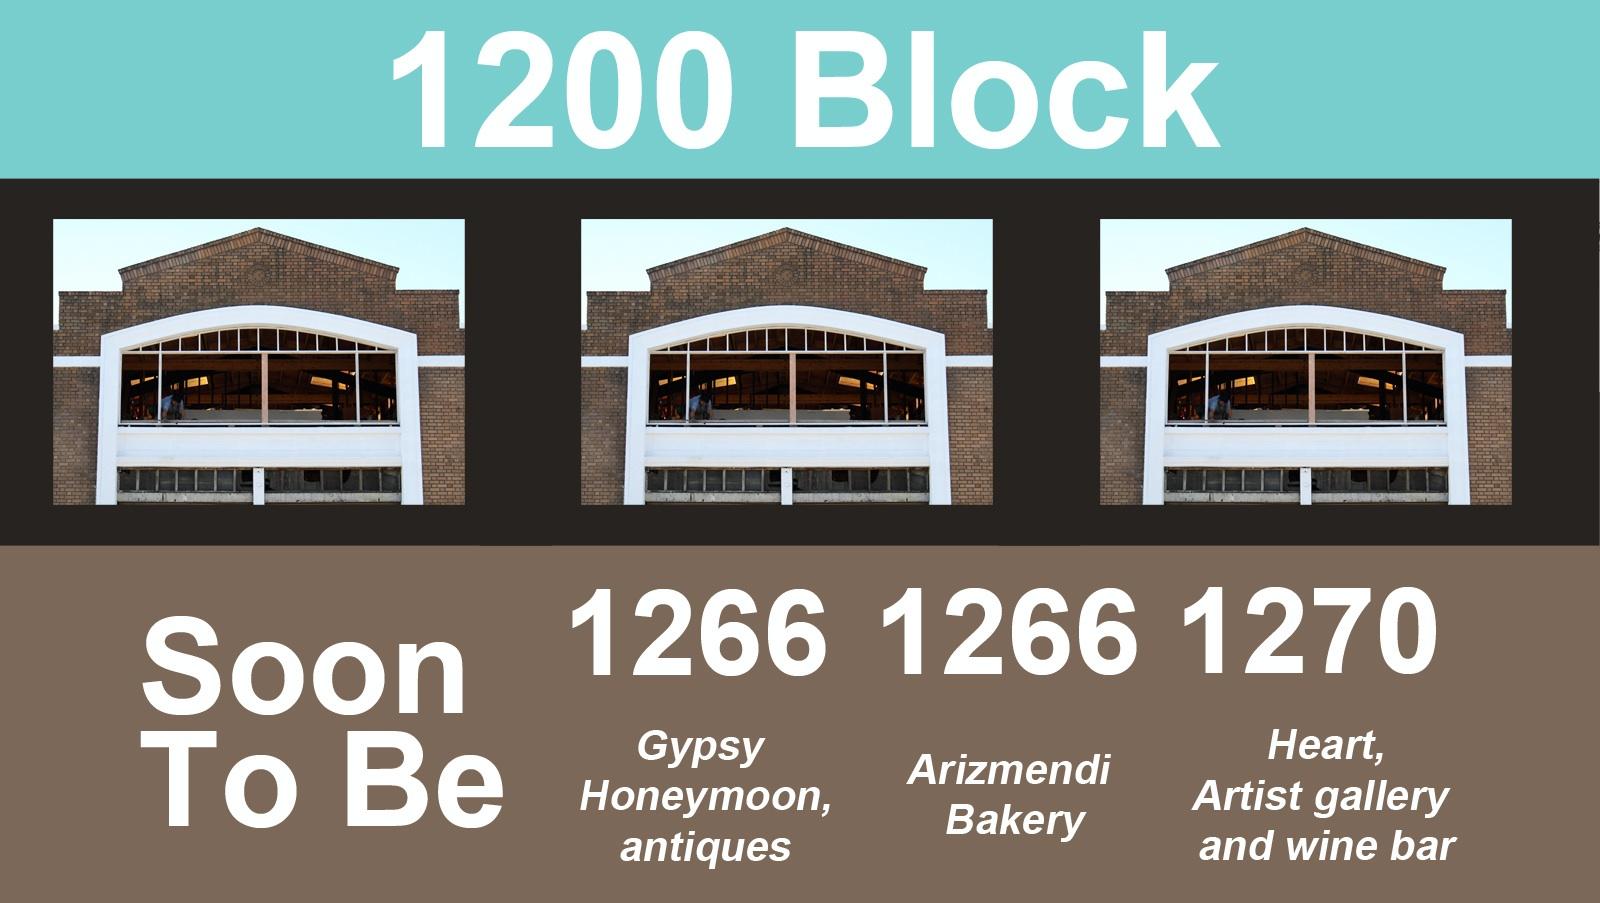 1200 Block